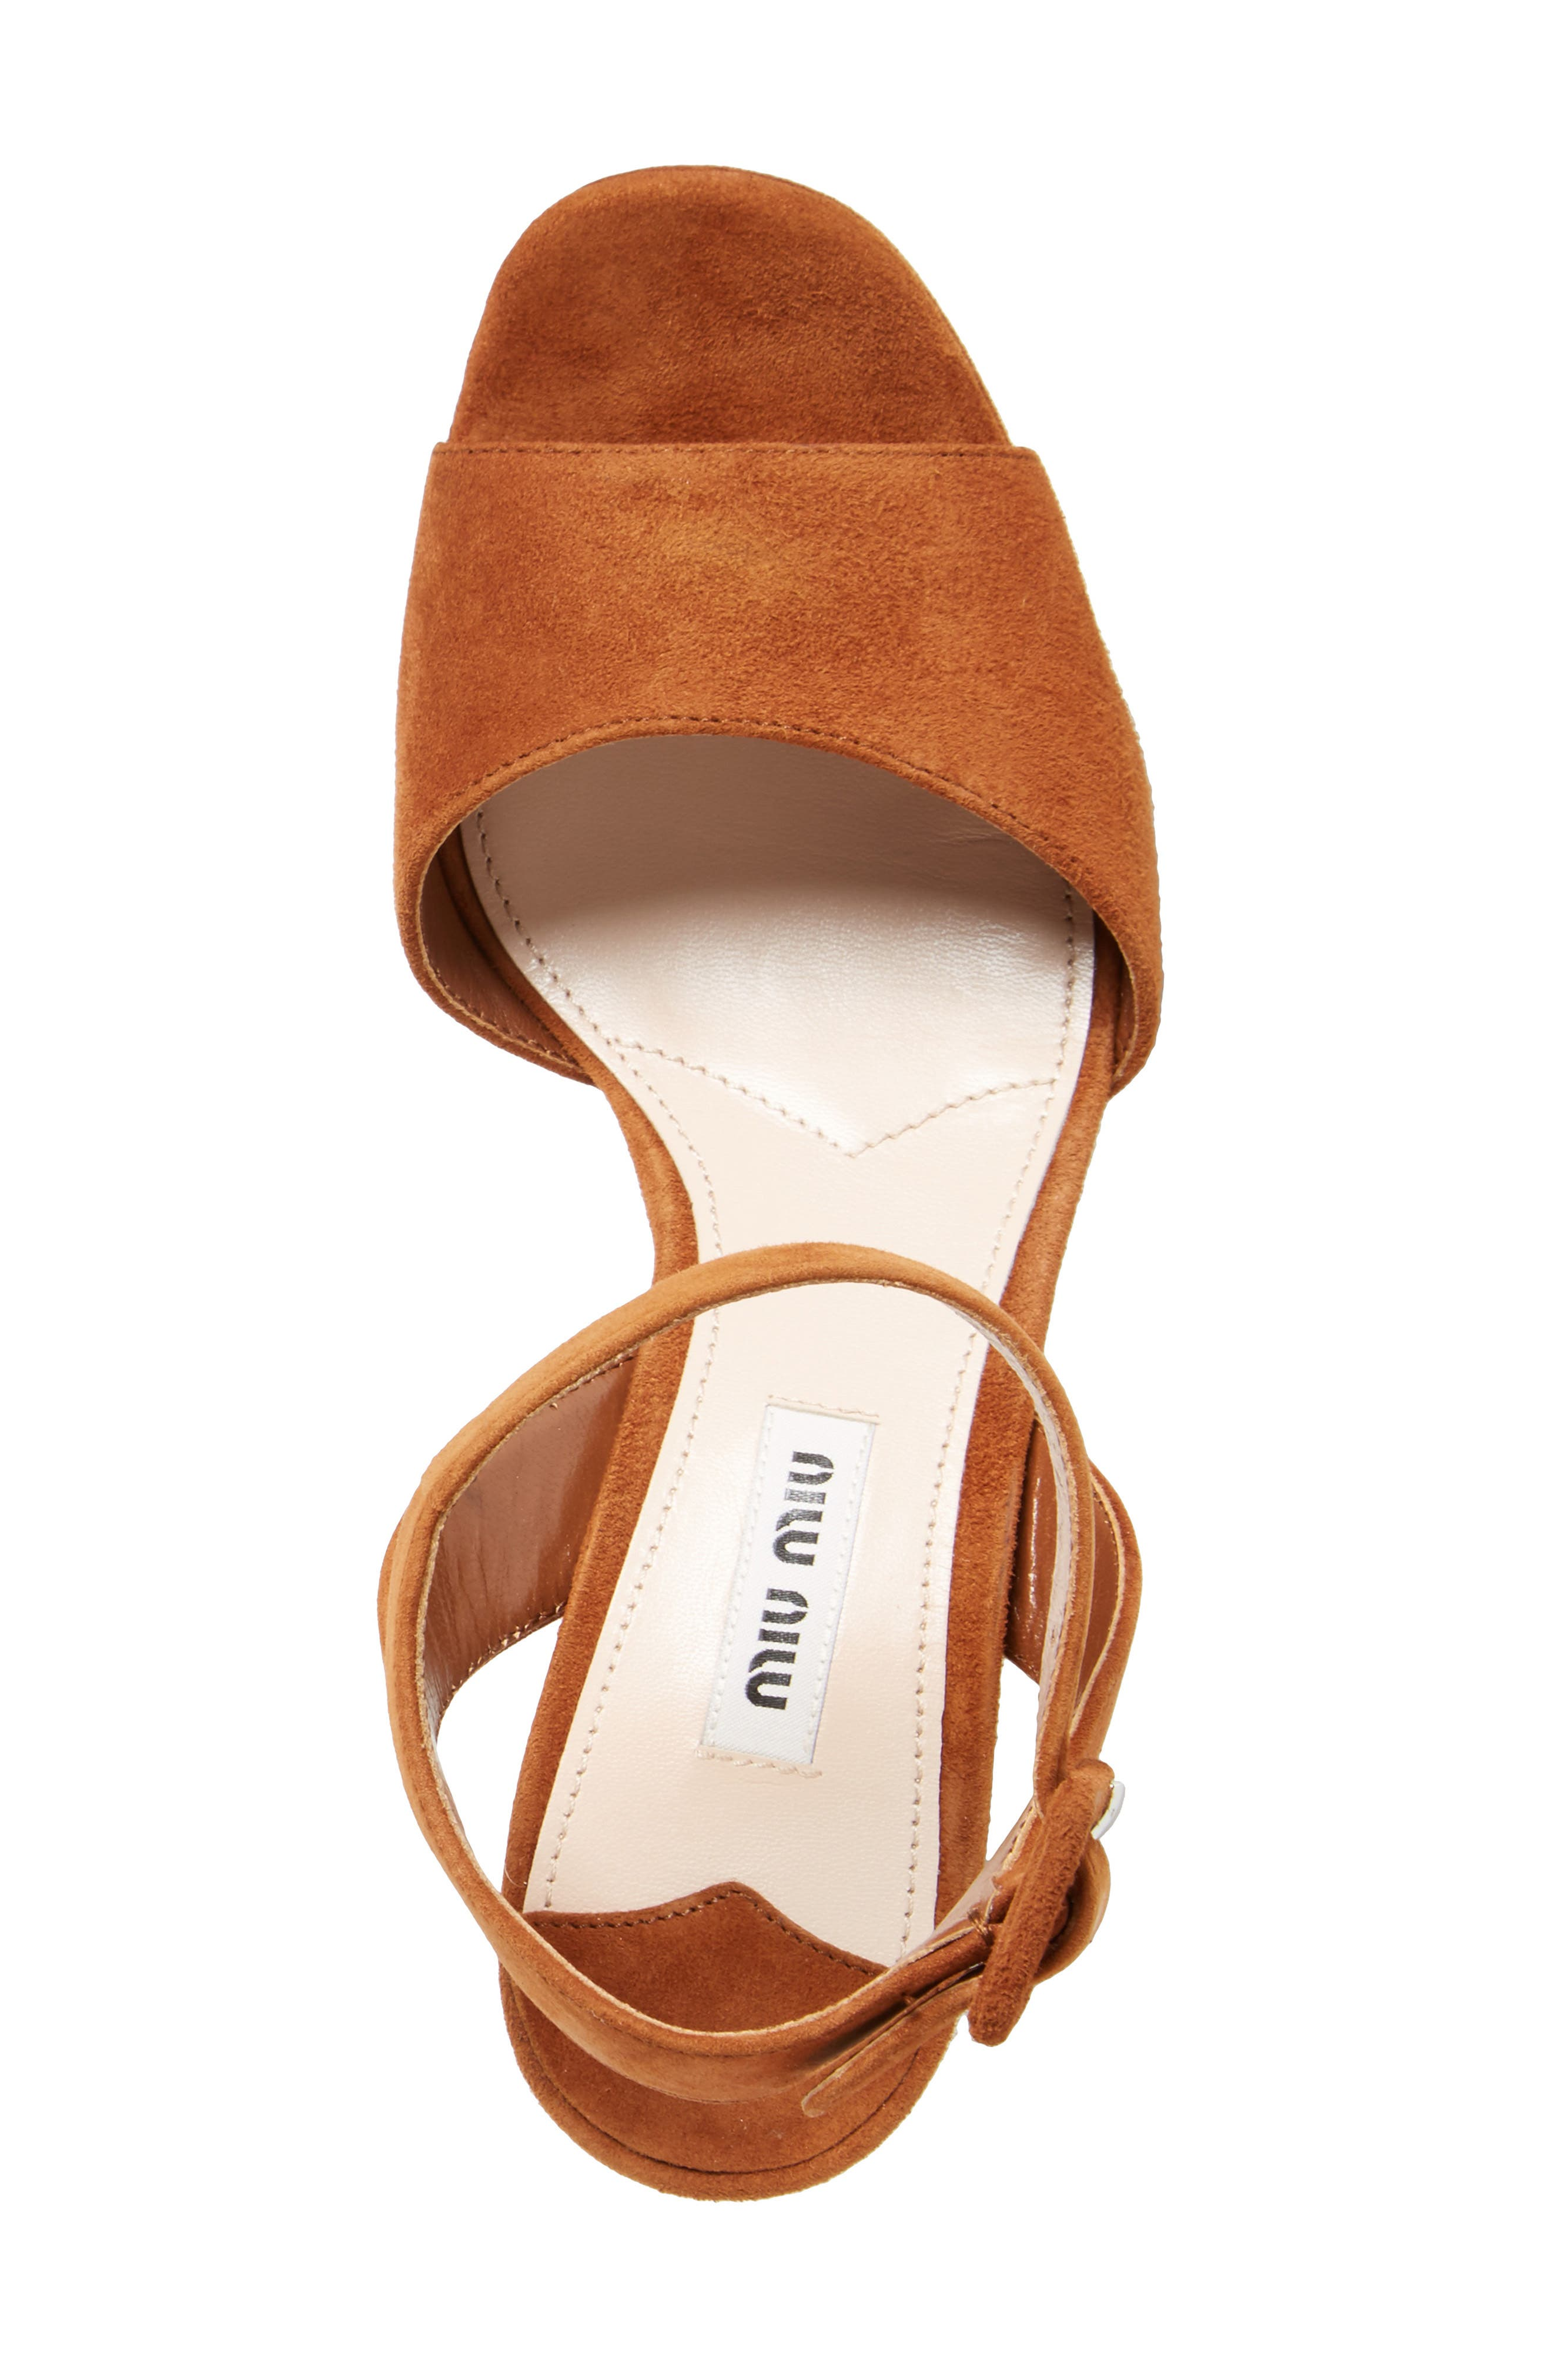 MIU MIU, 'Sandali' Ankle Strap Sandal, Alternate thumbnail 5, color, 200